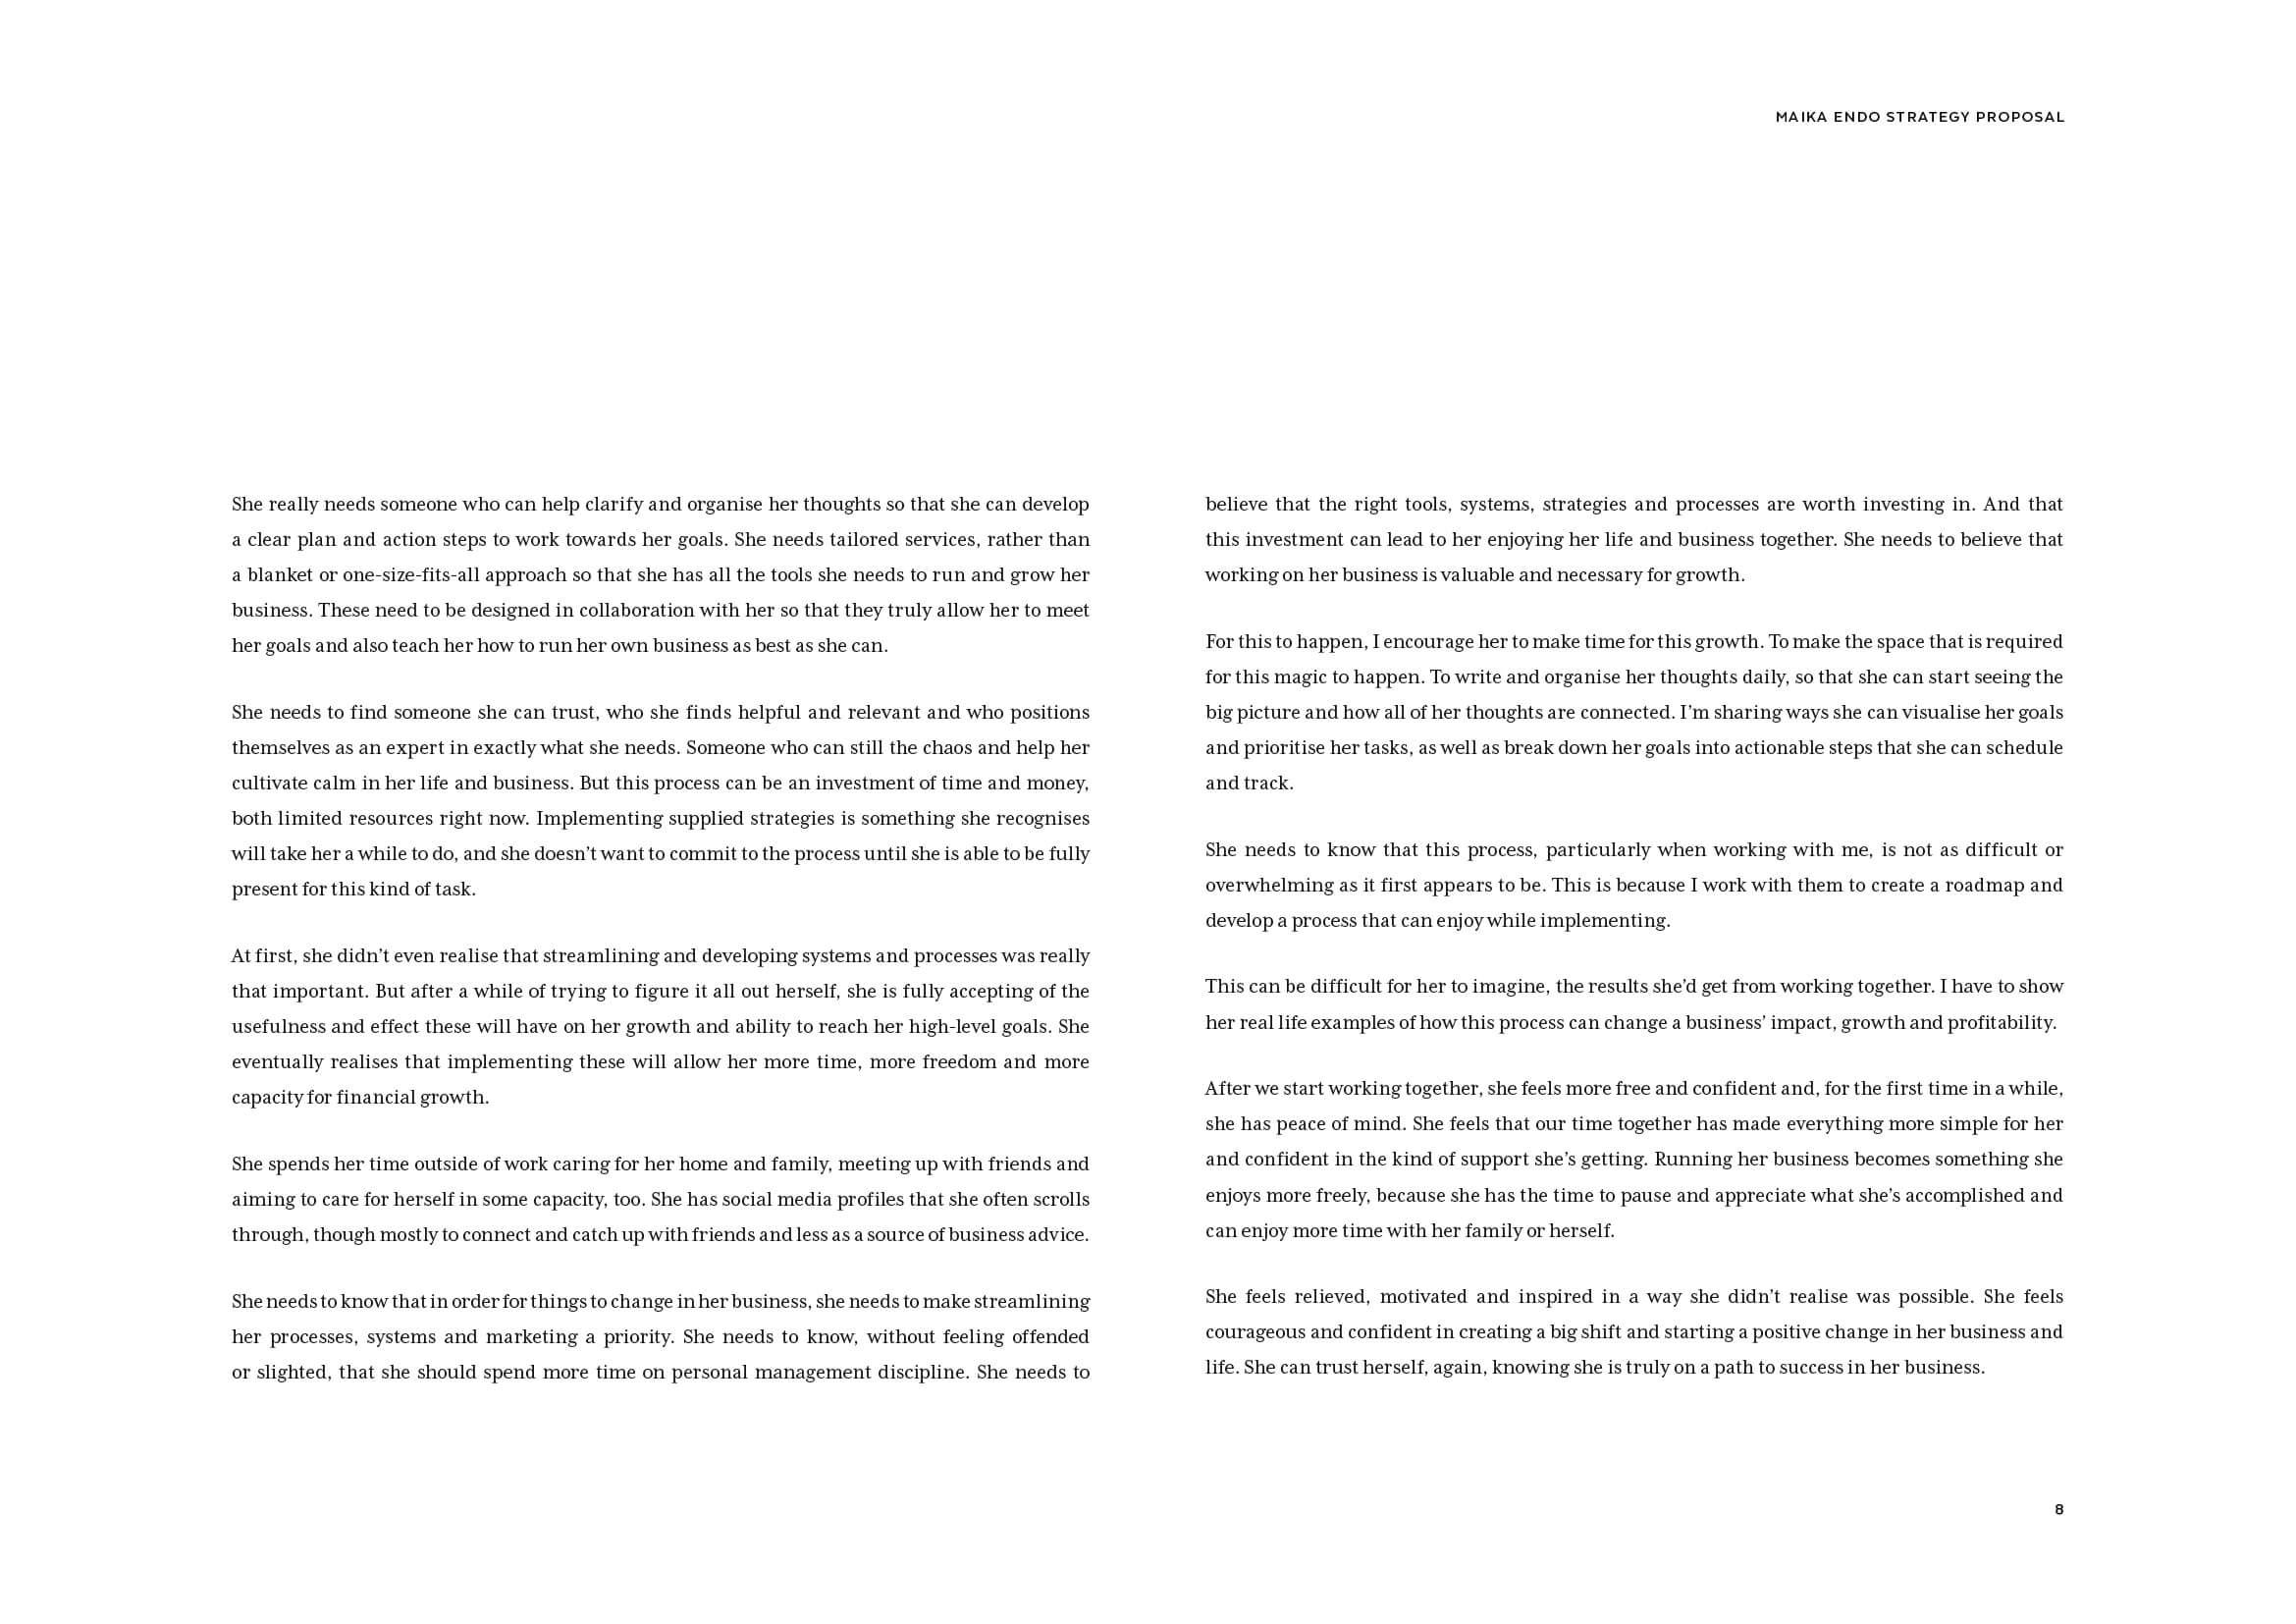 Maika Endo Strategy Proposal8.jpg